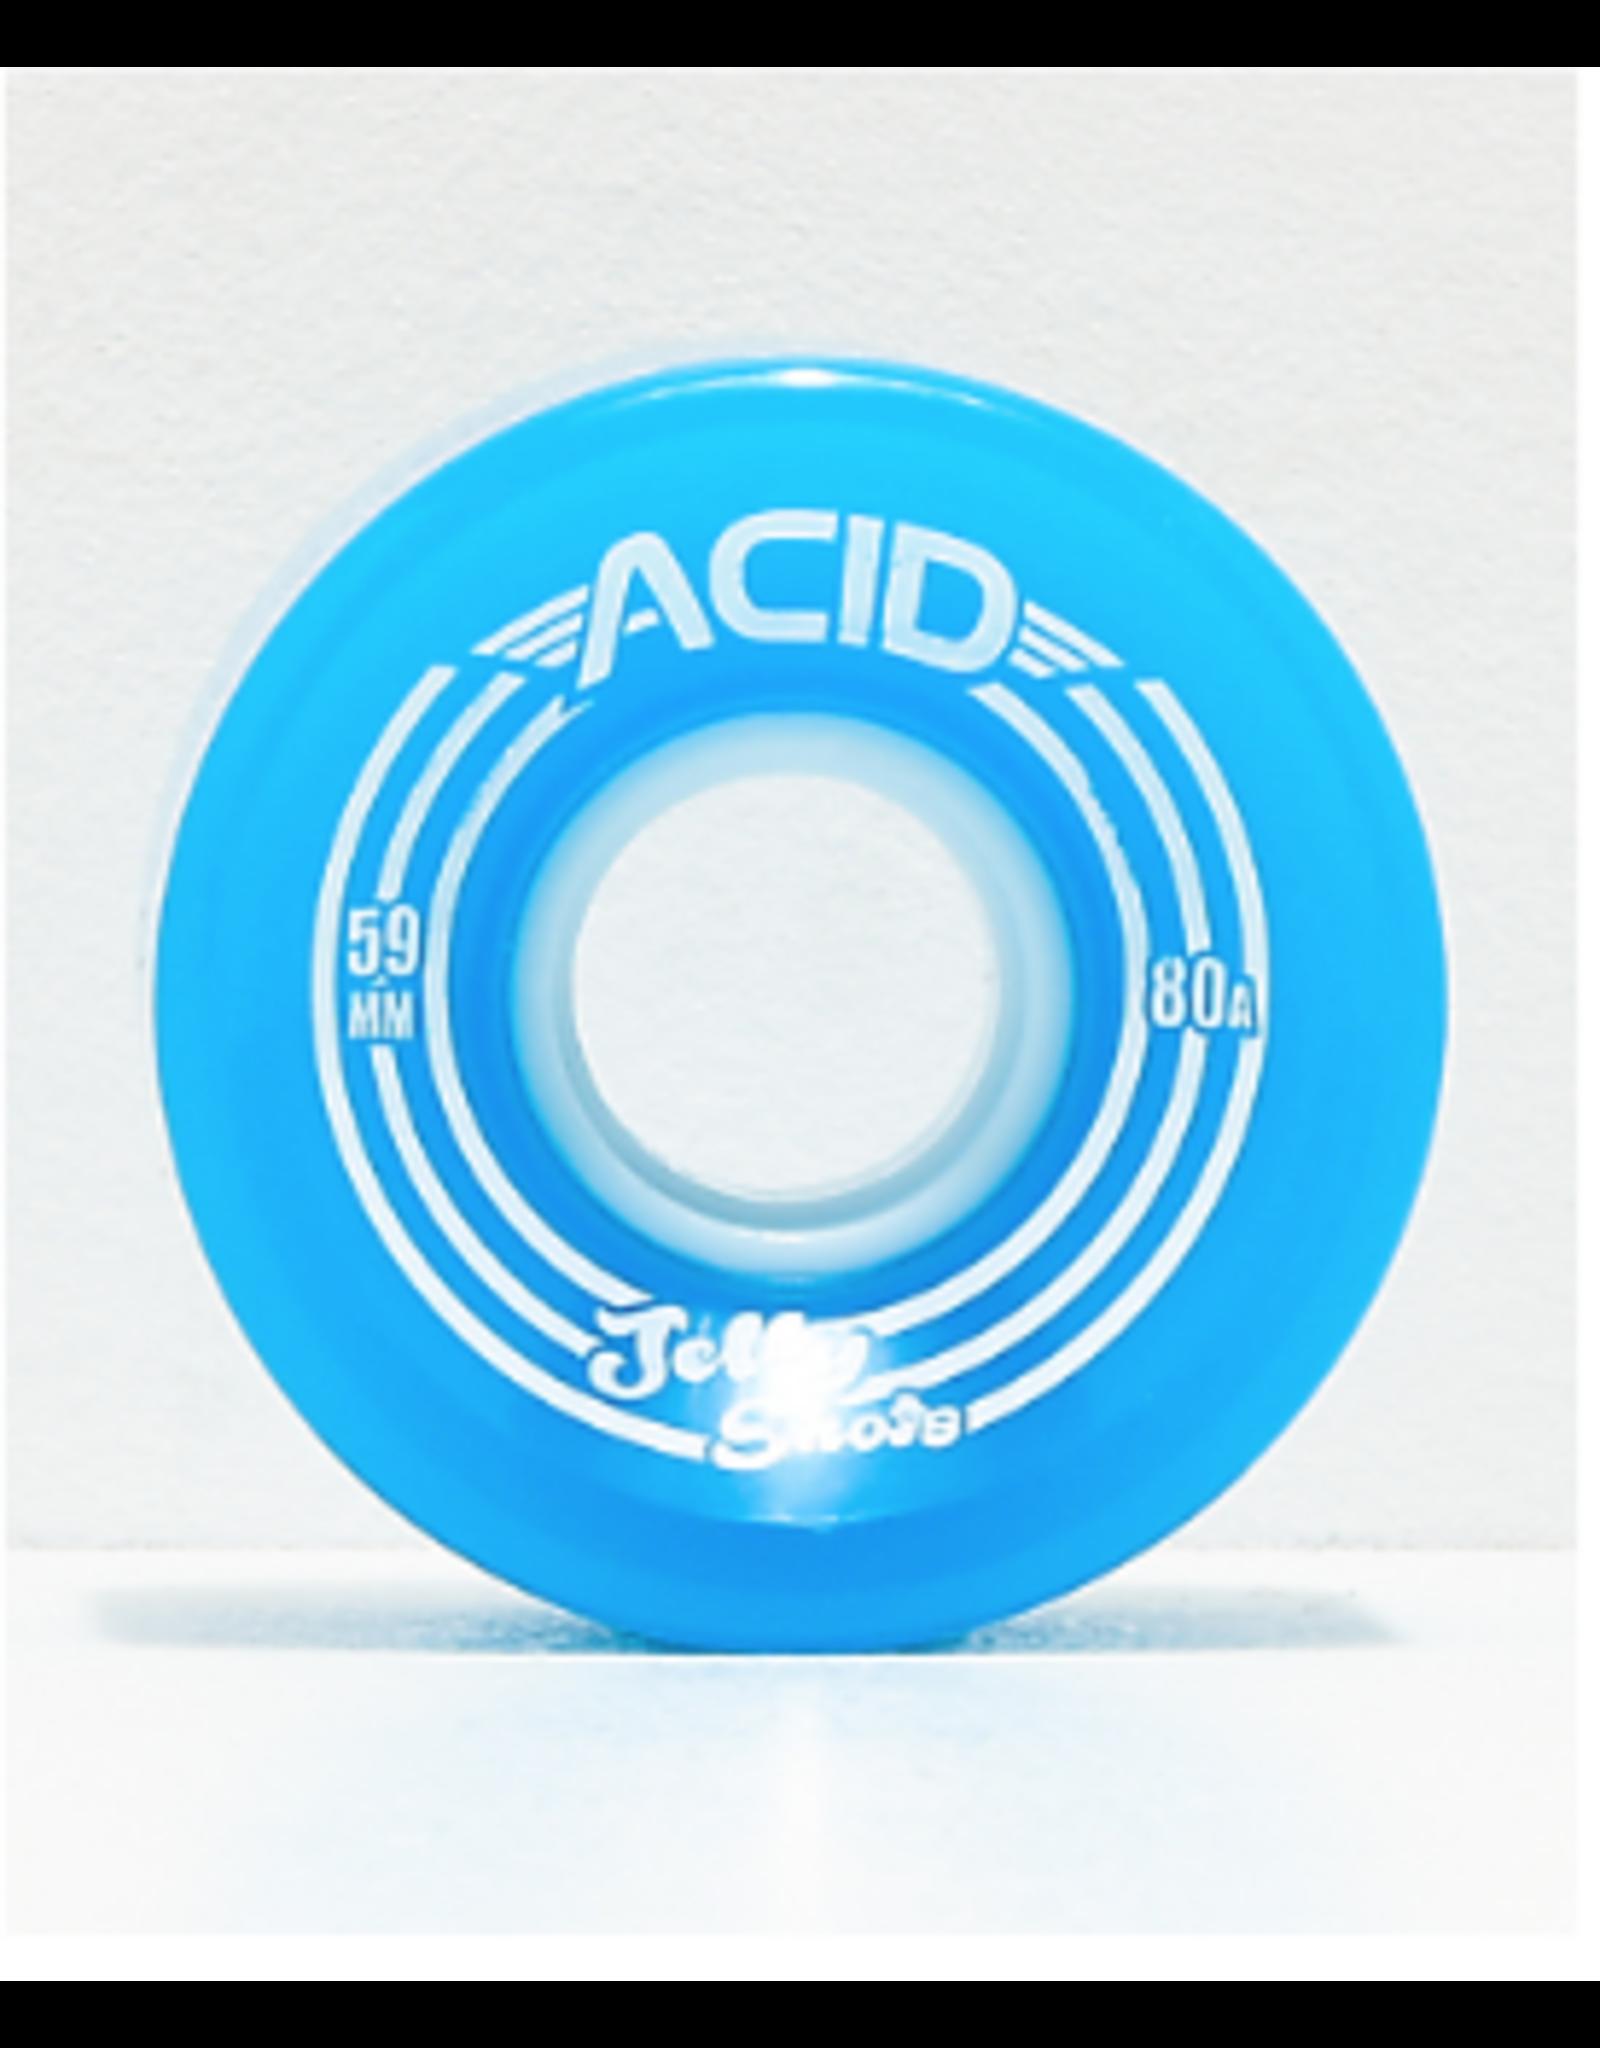 ACID ACID JELY SHOTS 59MM 82A BLUE